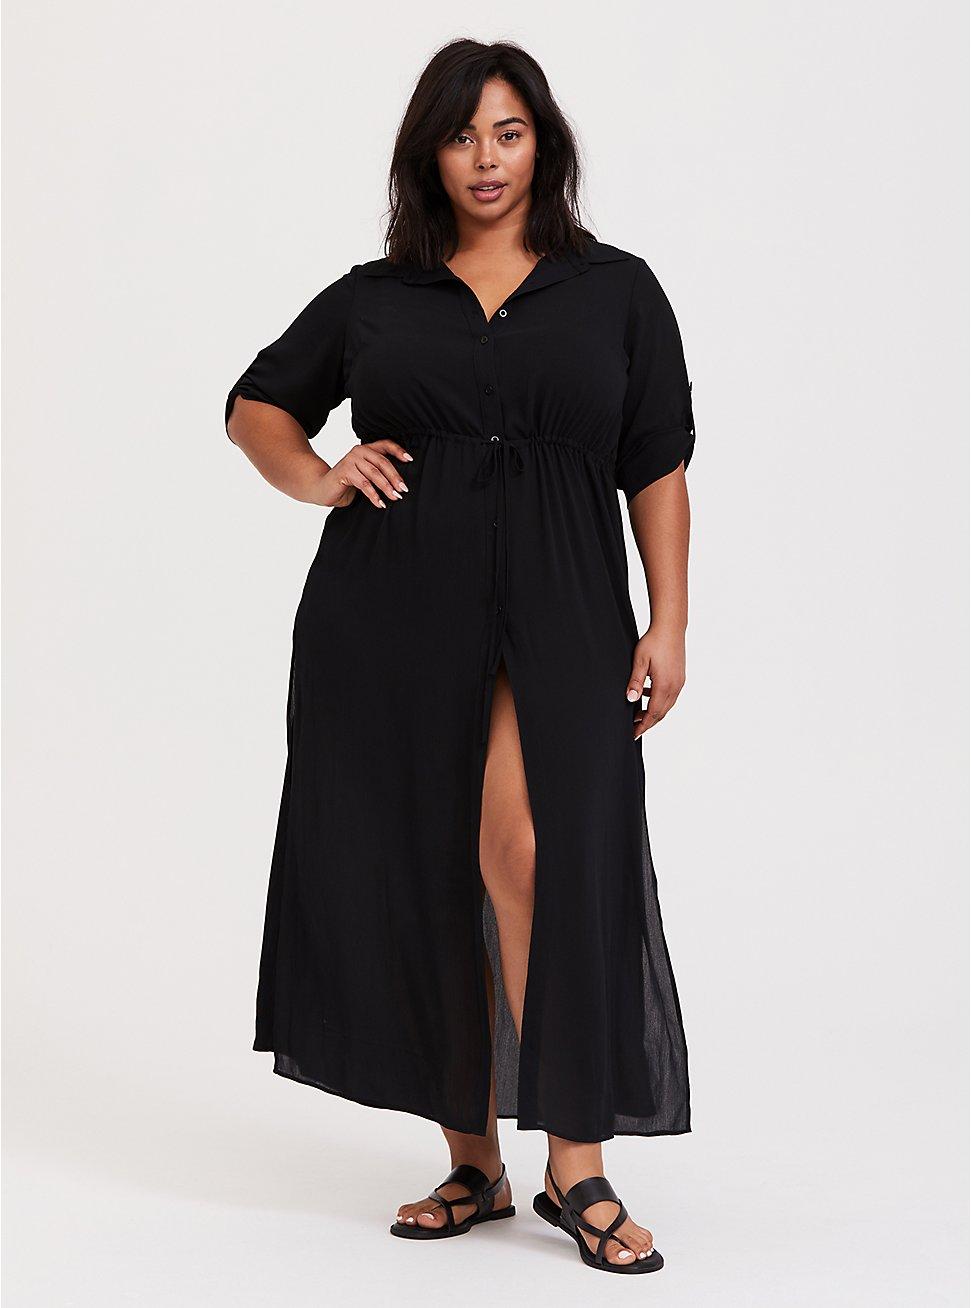 Black Crinkled Maxi Shirt Dress Swim Cover-Up, DEEP BLACK, hi-res